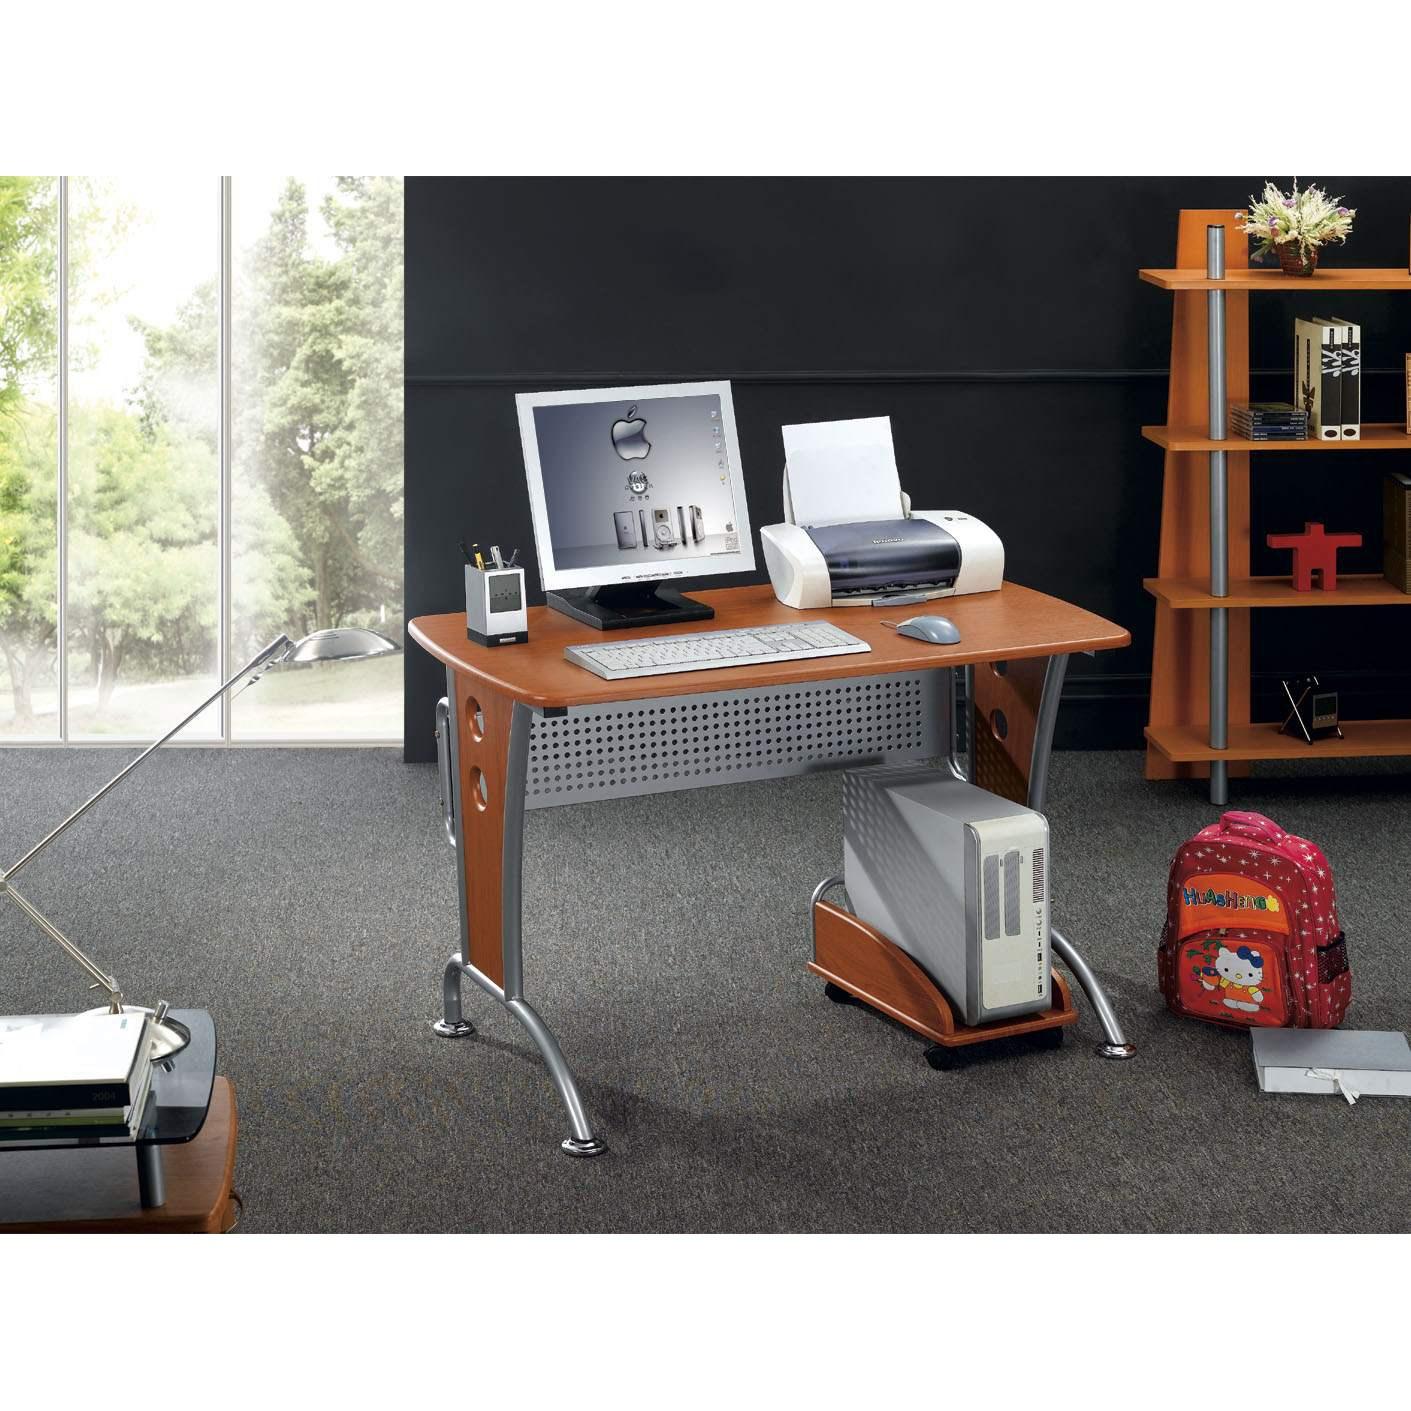 Techni Mobili Desks | Techni Mobili Desk | Techni Mobili